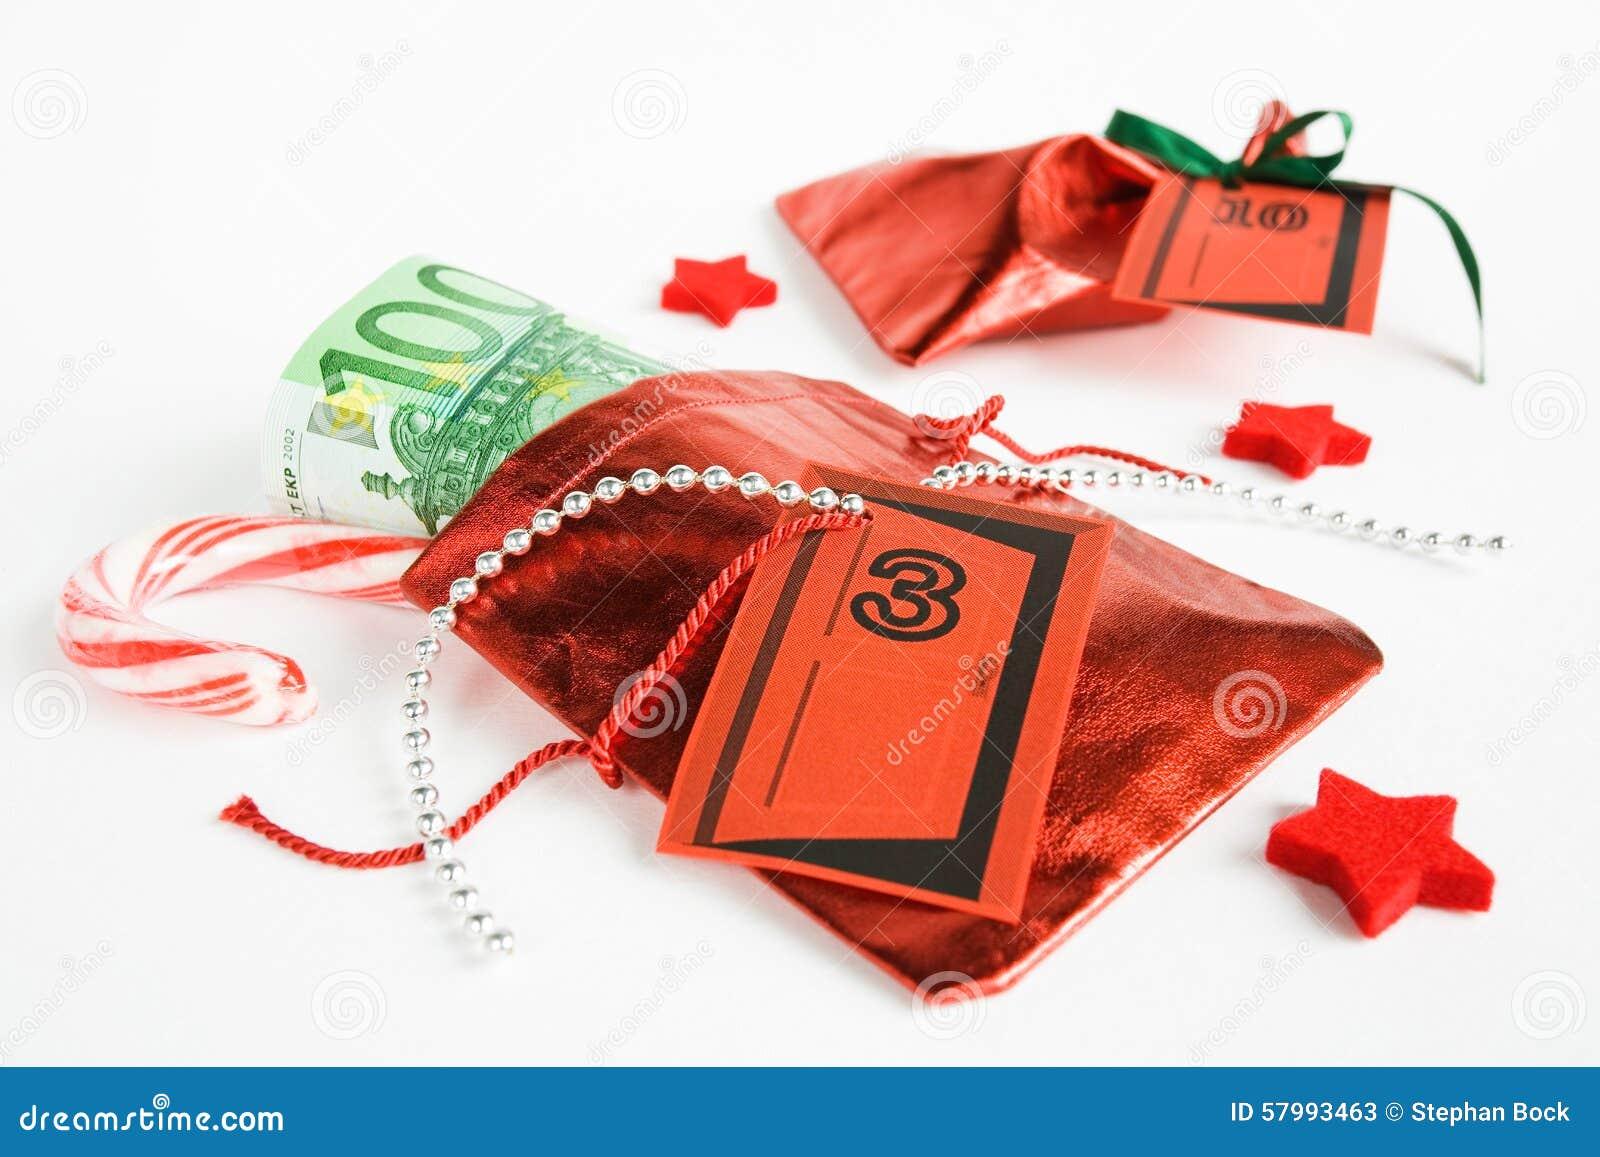 Calendario Di Borsa.Regalo Di Natale Calendario Di Arrivo Piccola Borsa Con